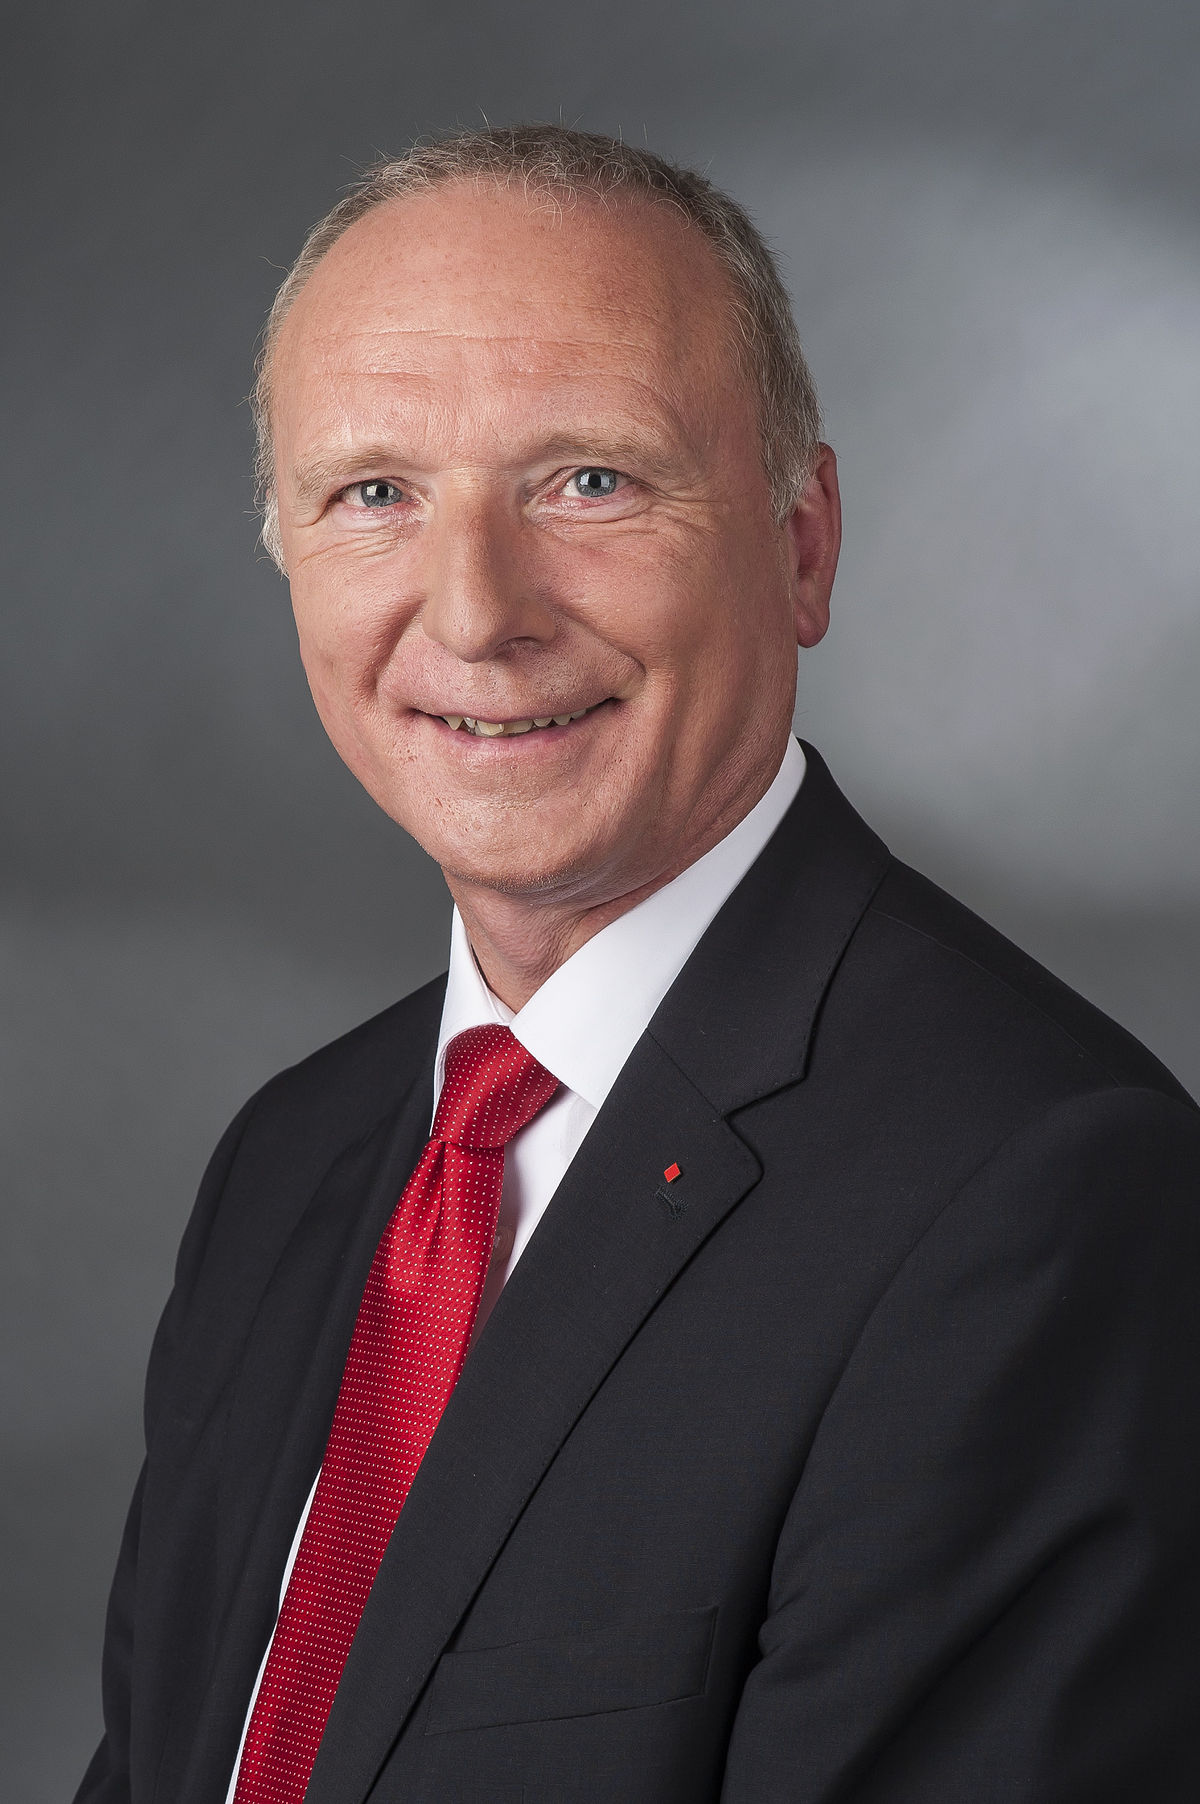 bernd westphal  politiker   u2013 wikipedia